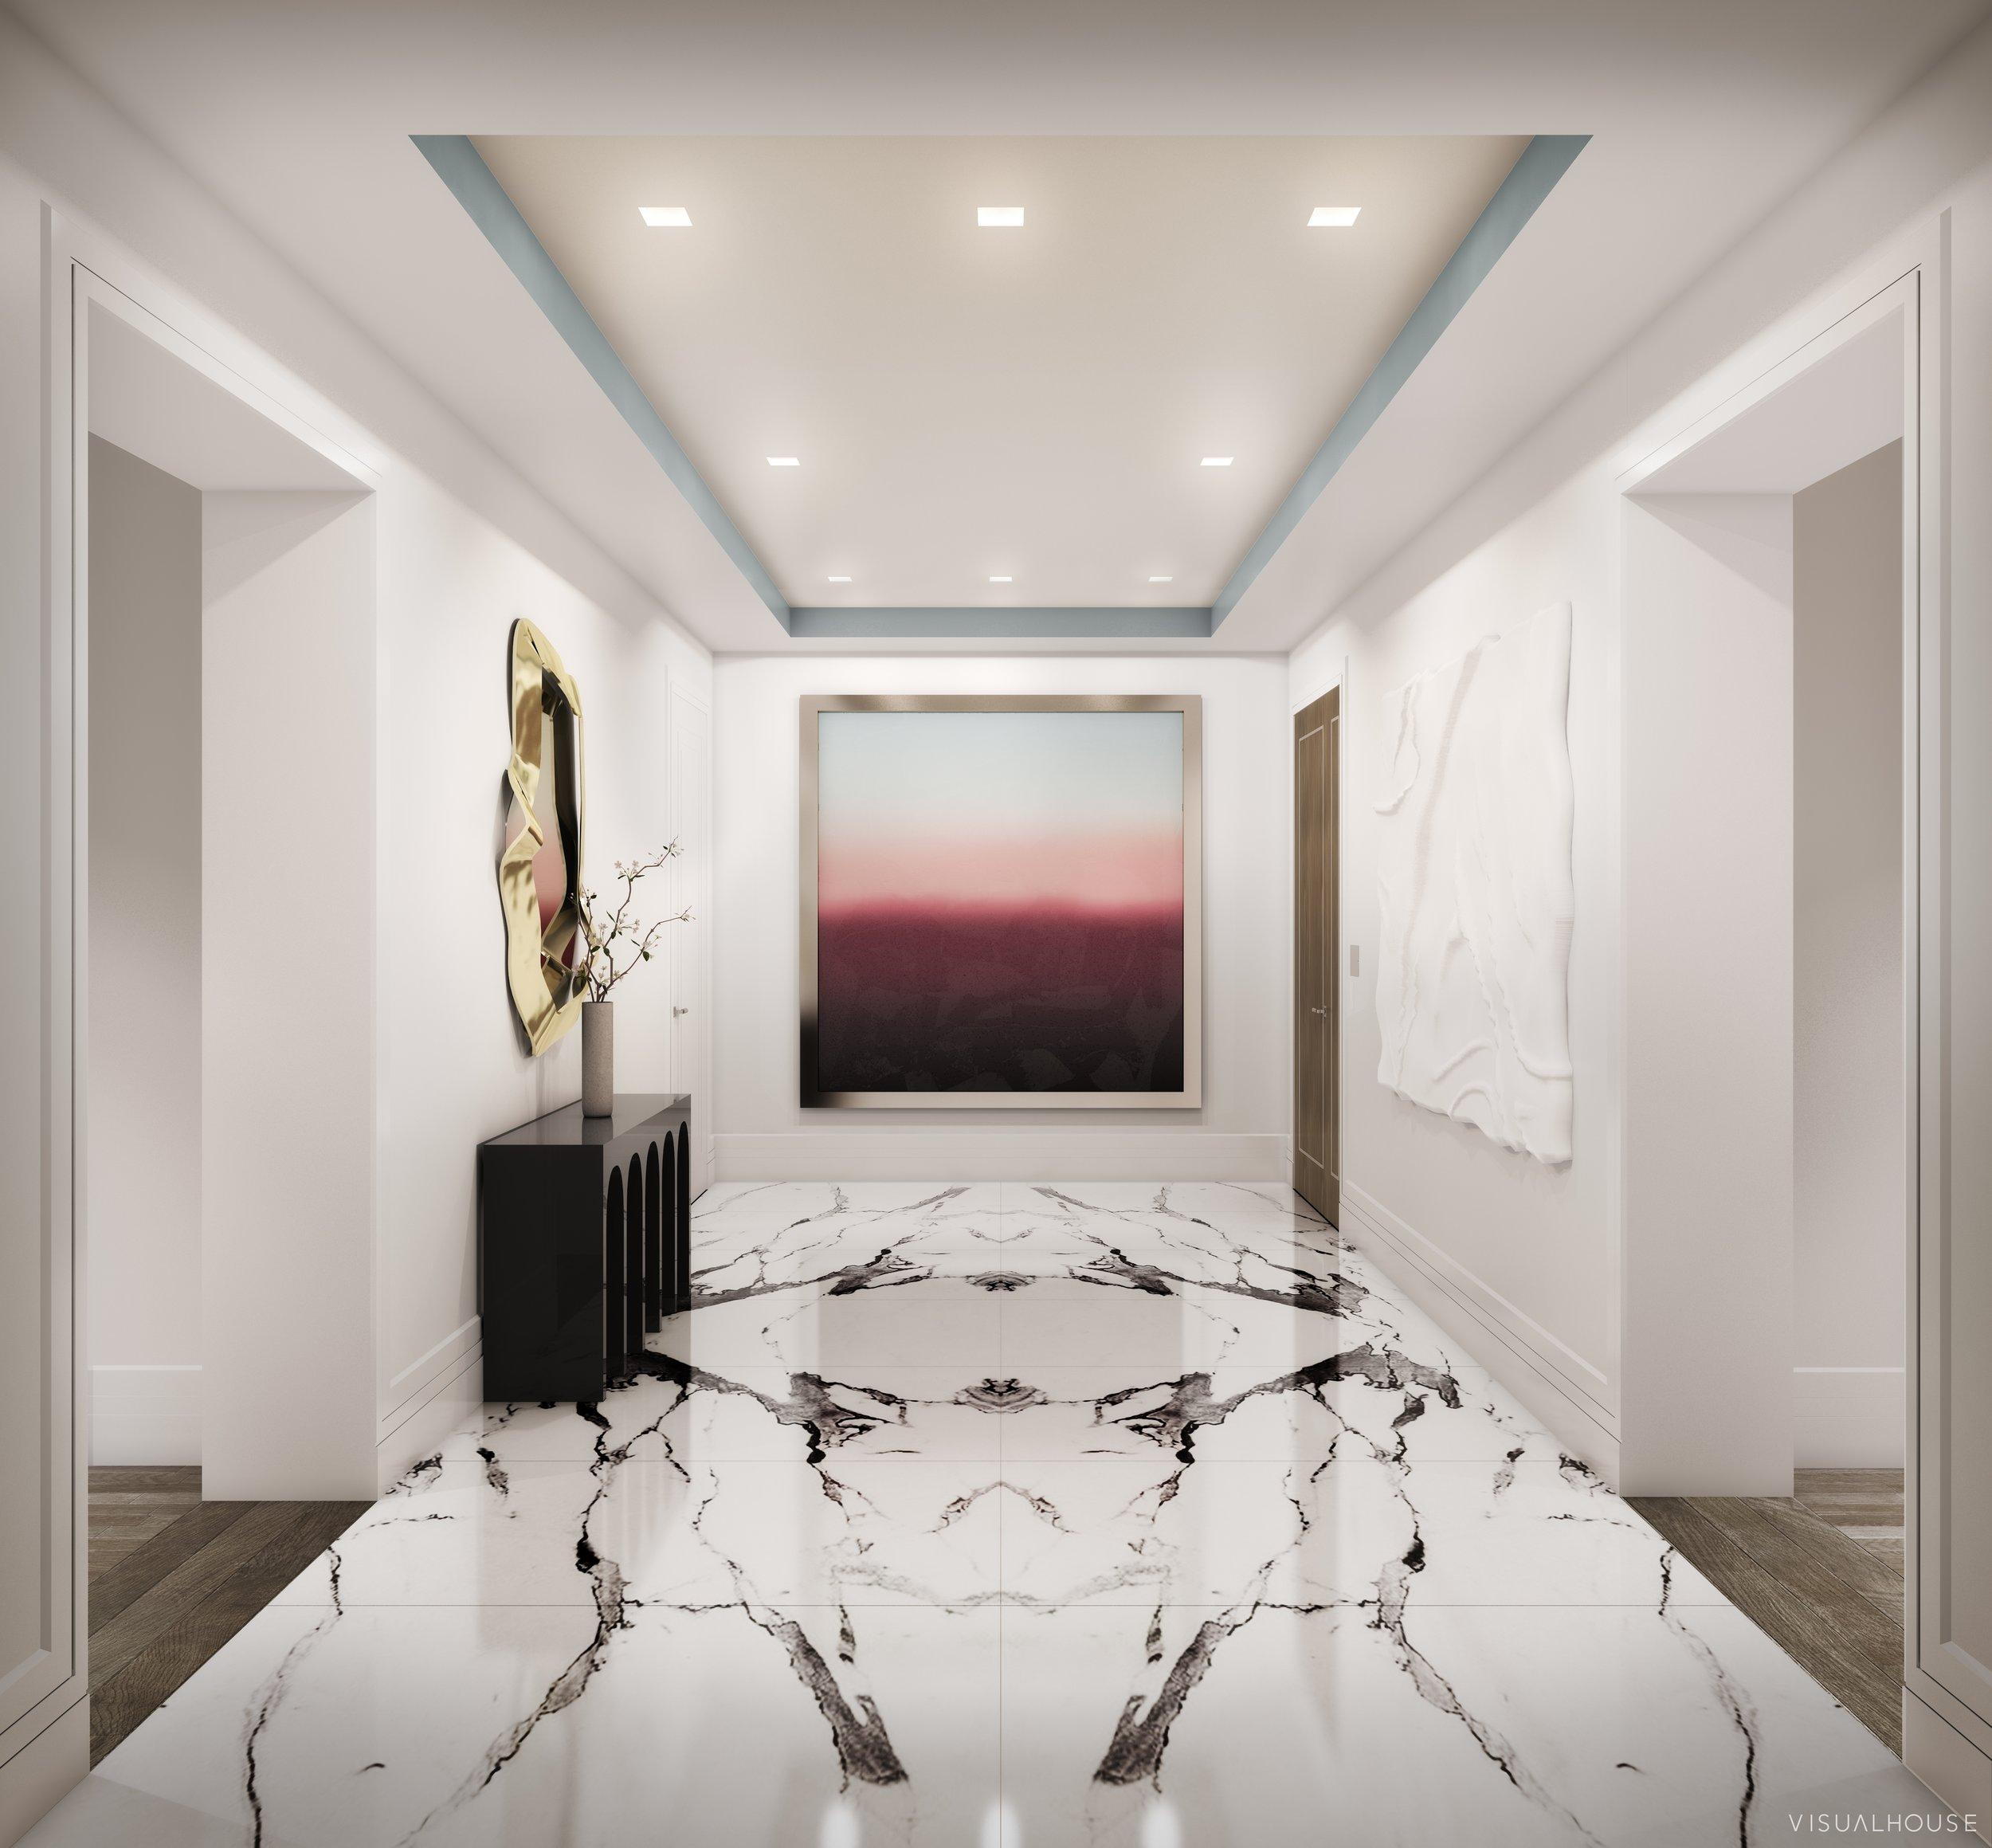 visualhouse_Foyer___Entrance_-_Update-8.0[1].jpg